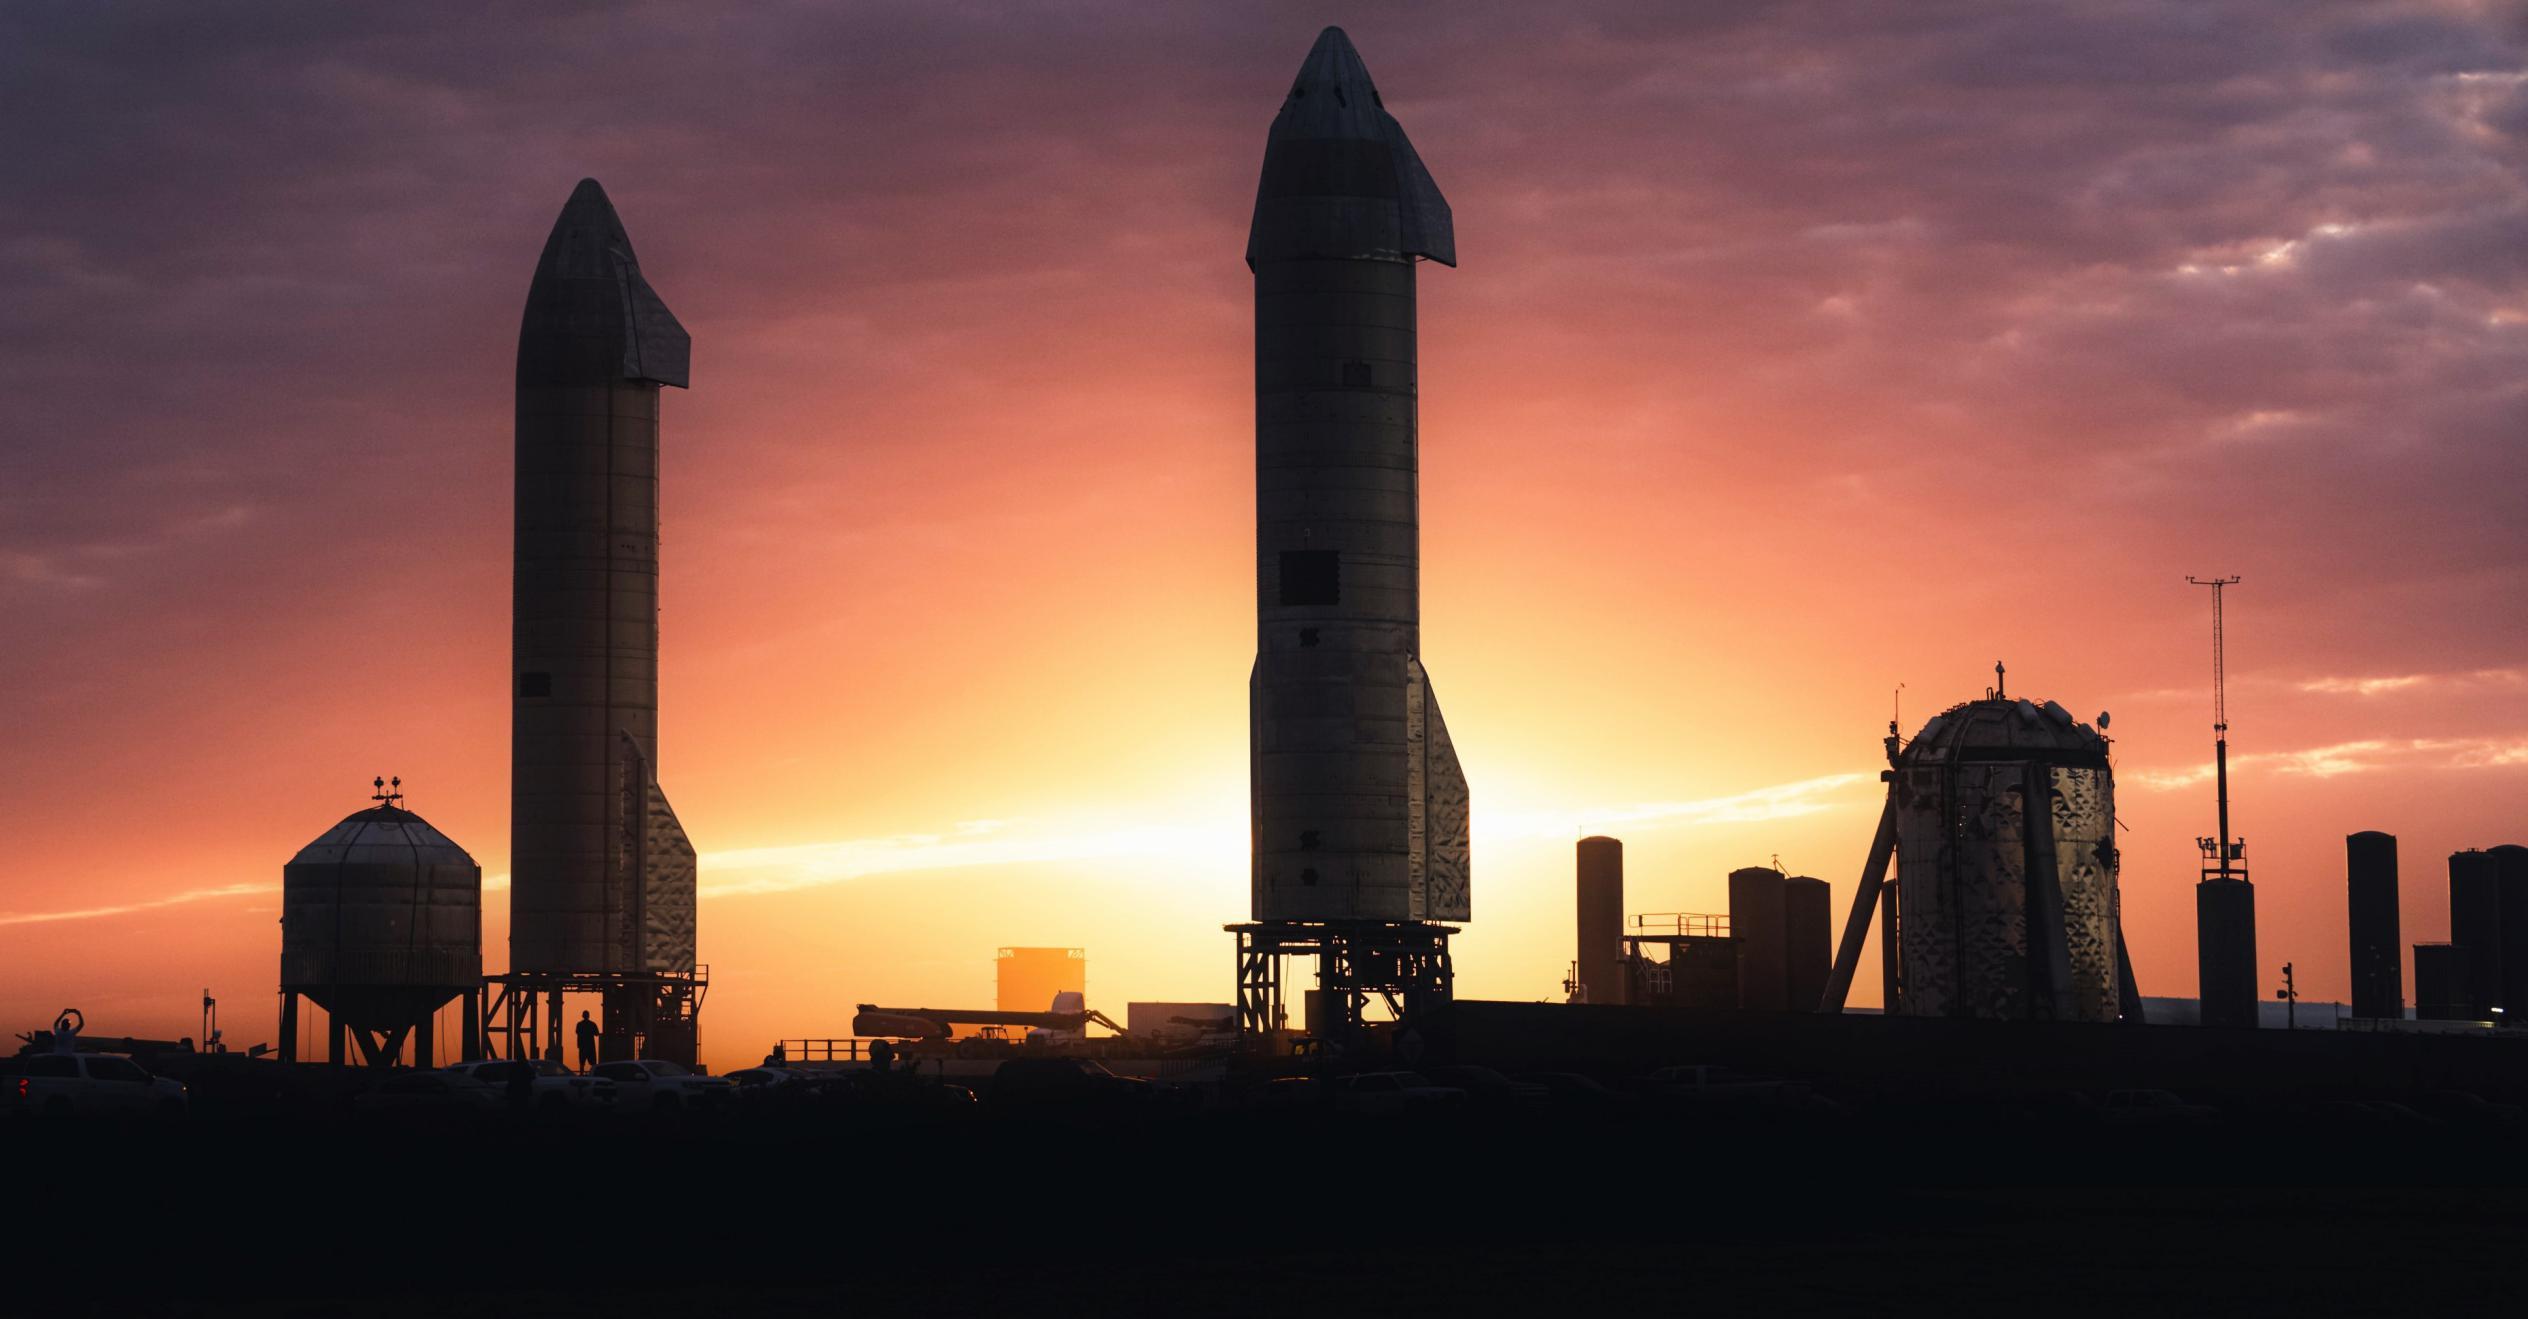 Starship SN9 launch (SpaceX) prelaunch 1 crop (c)